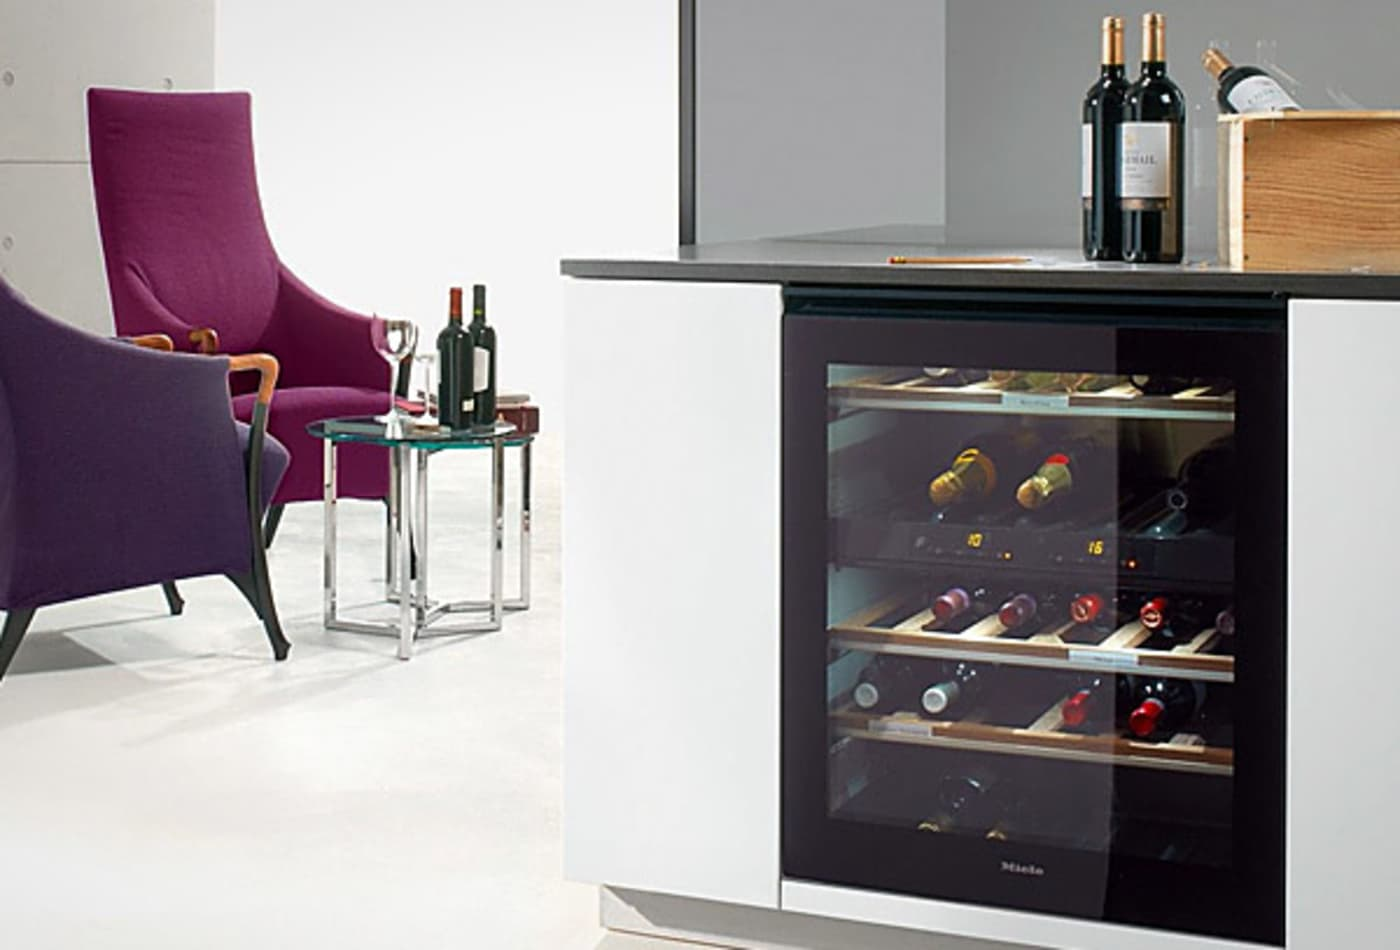 10-Smart-Dig-Appliances-Wine.jpg